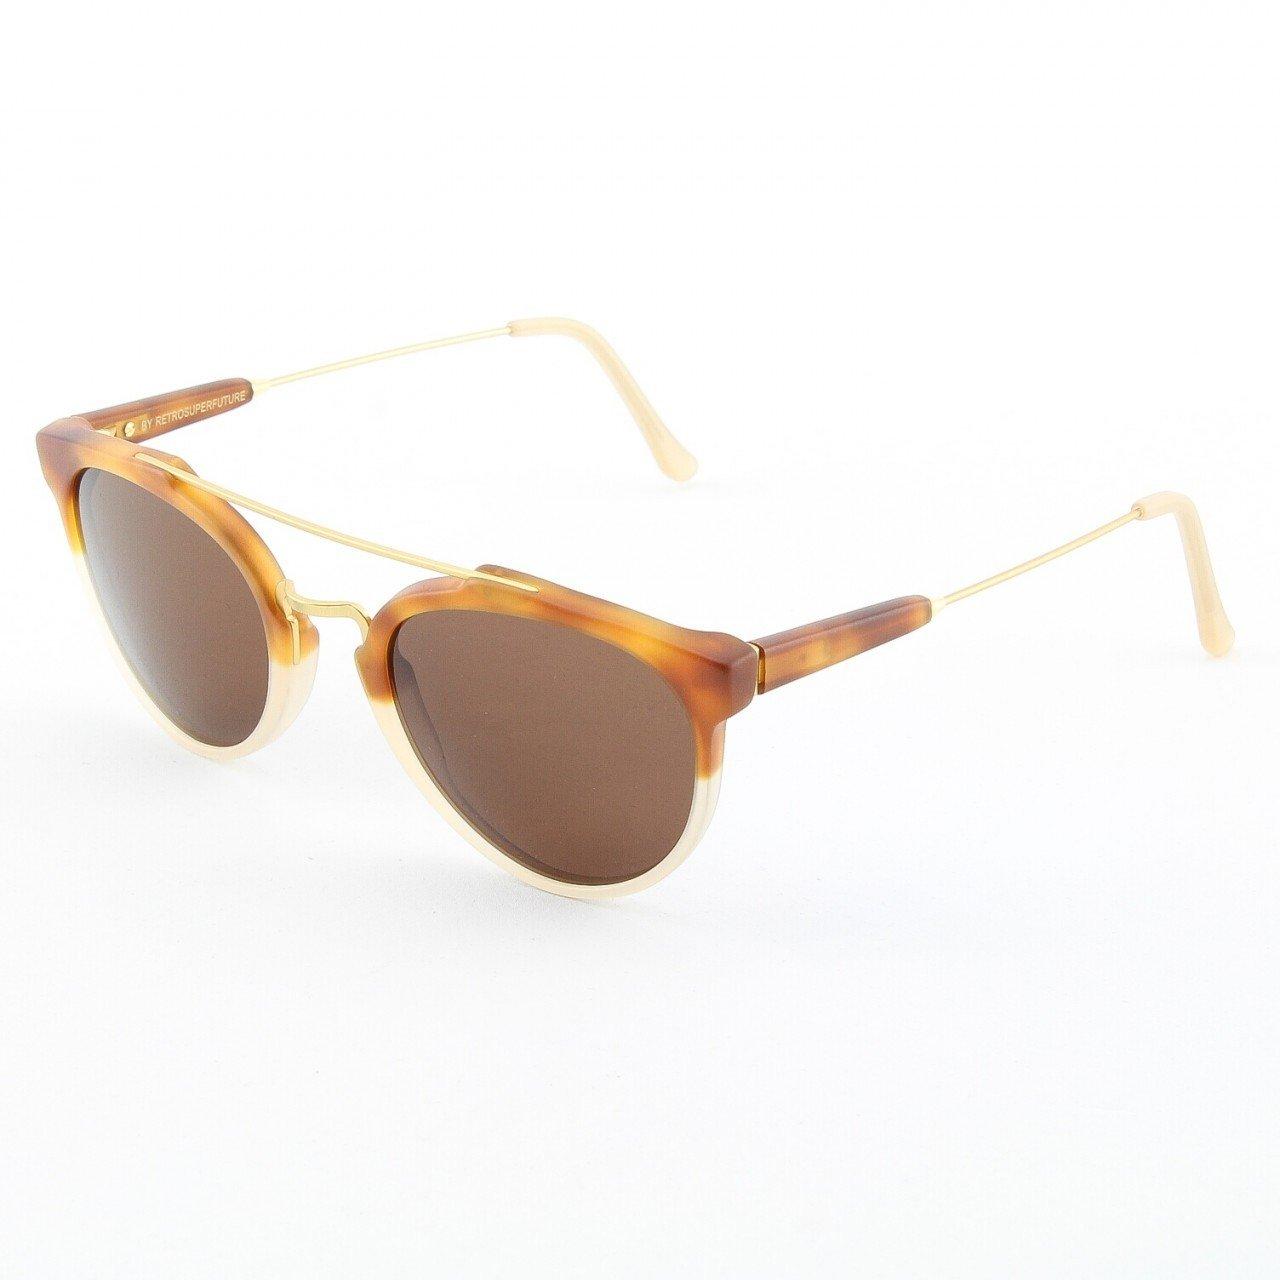 Super Giaguaro 472/3A Sunglasses Color Caffelatte Brown Havana Beige by RETROSUPERFUTURE